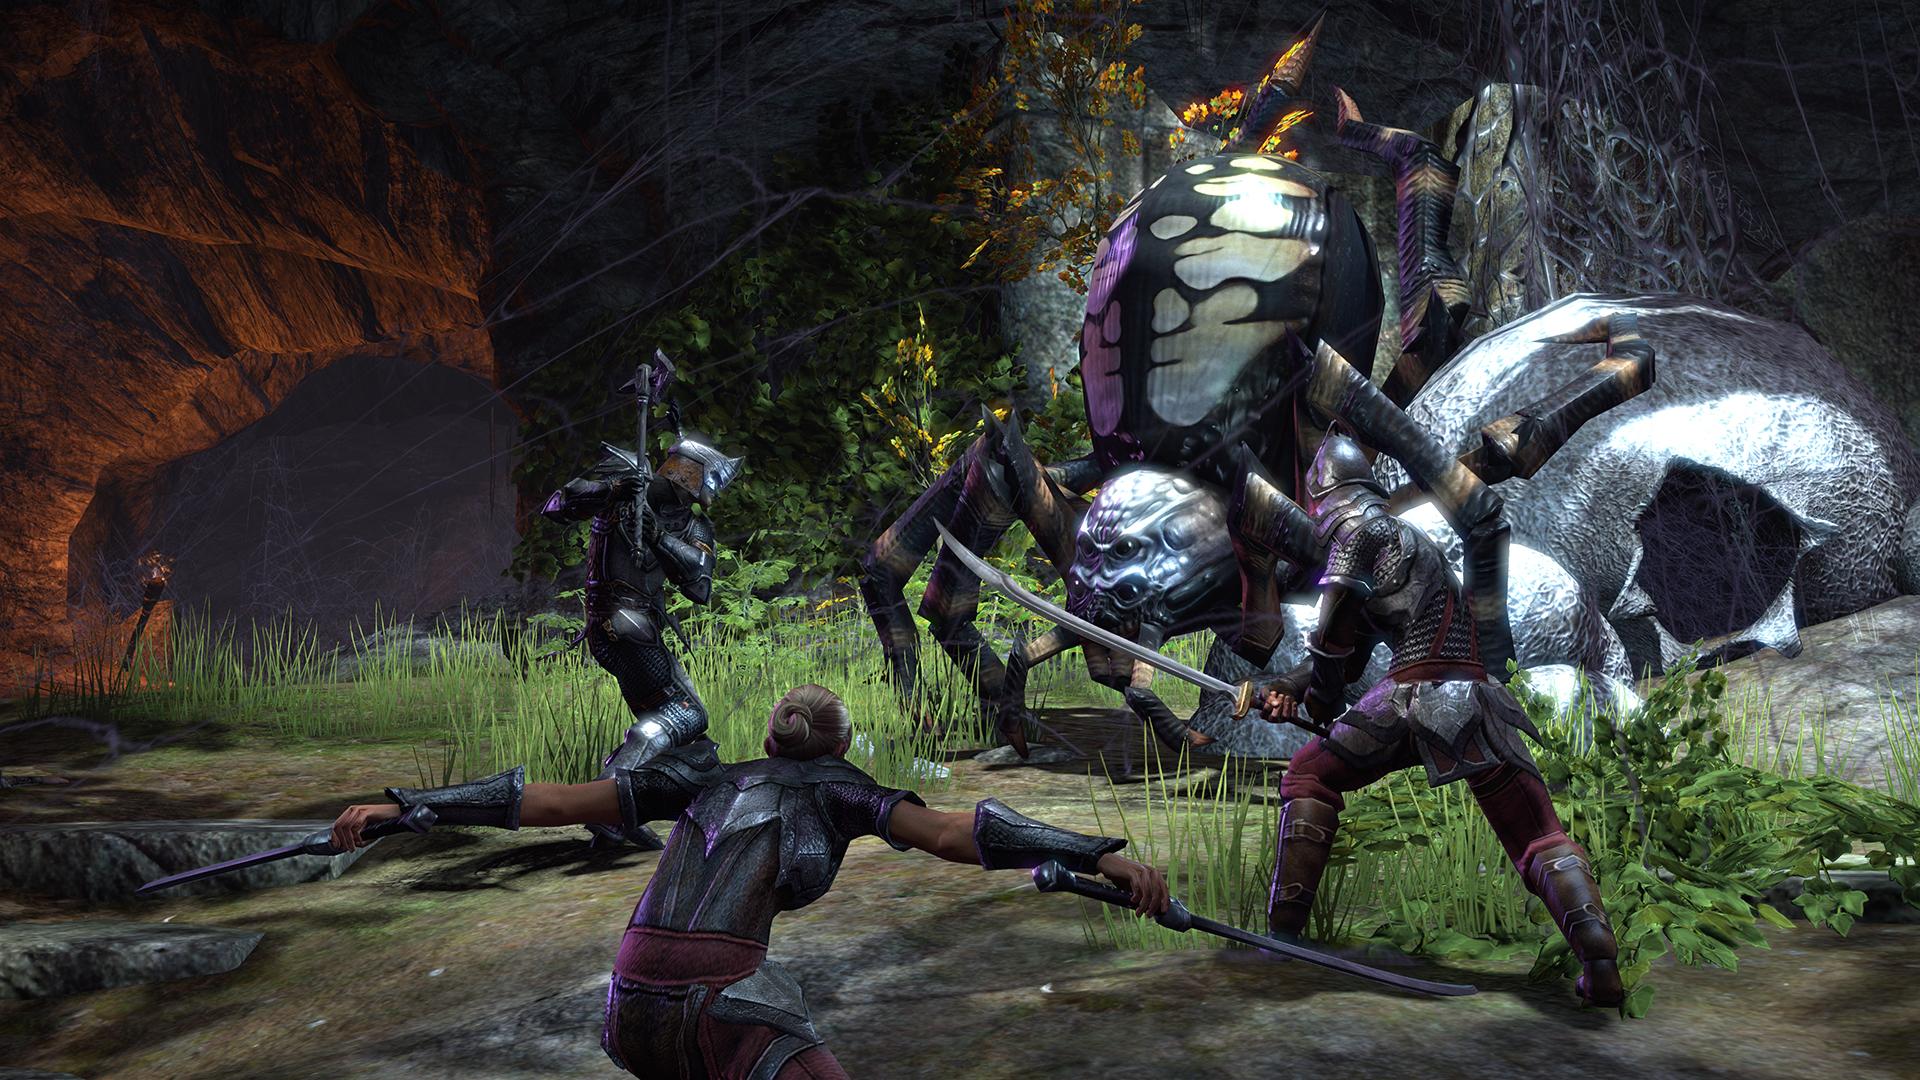 elder scrolls online guild battle